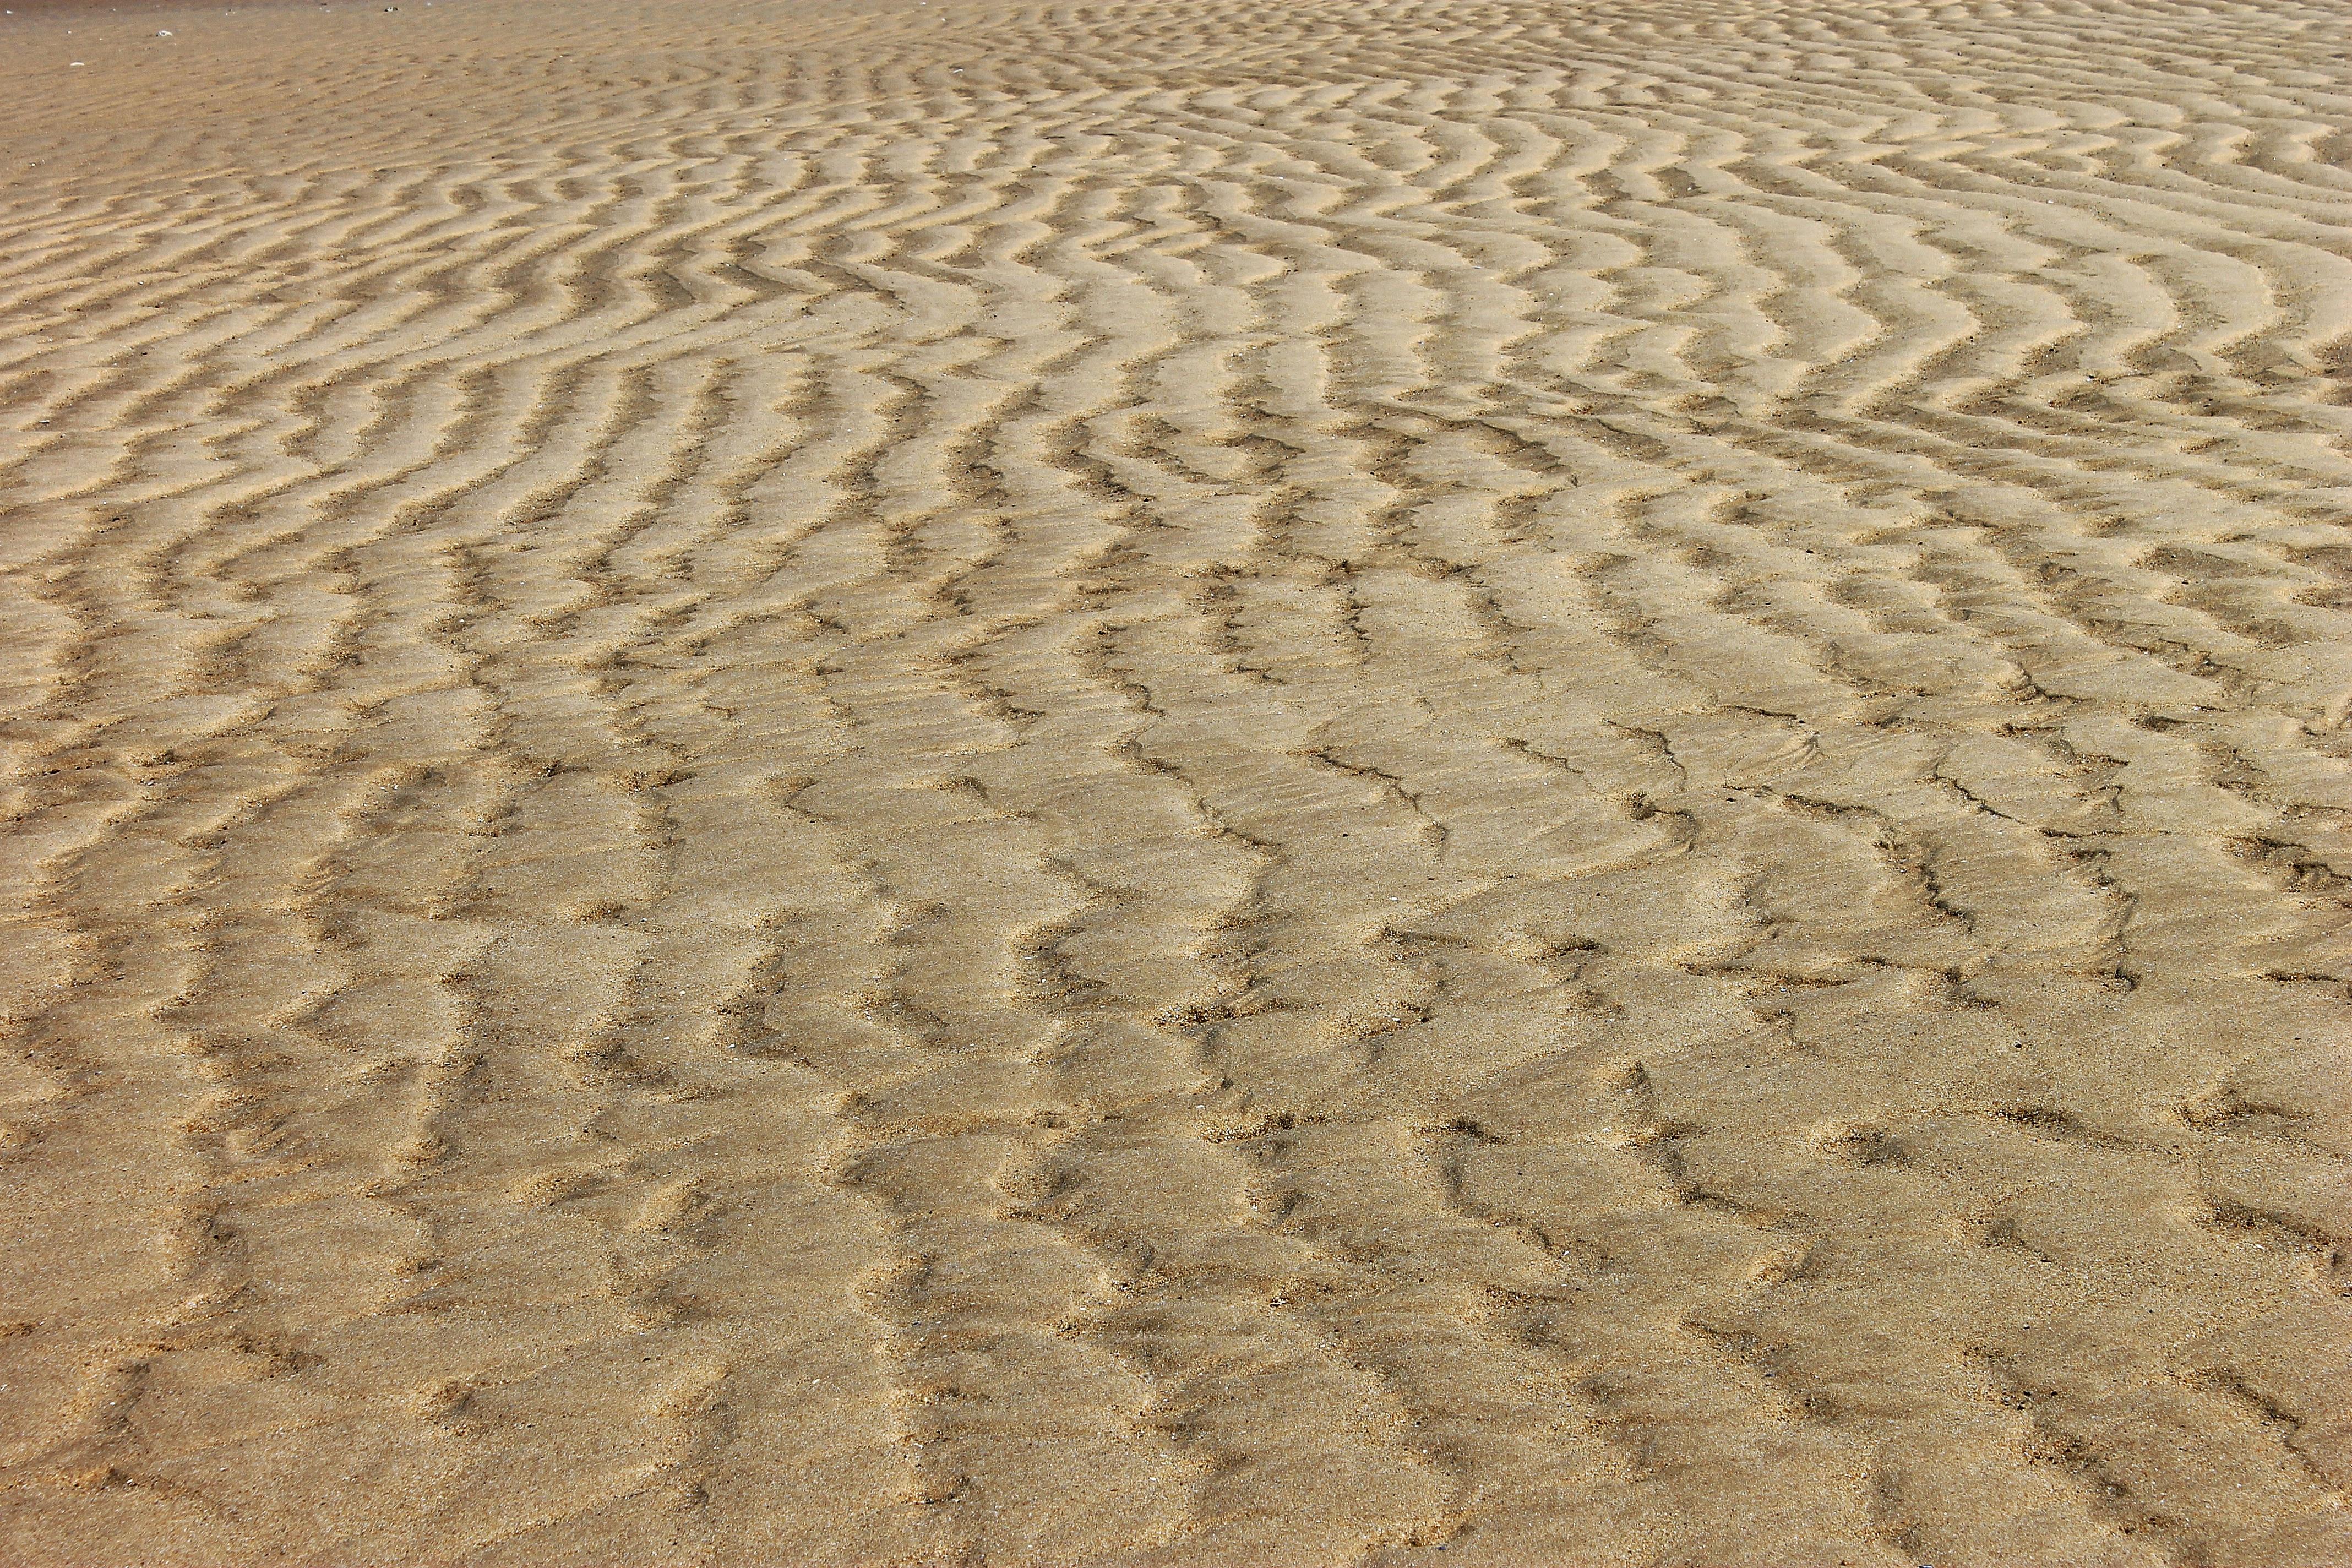 Beach Sea Nature Sand Ocean Texture Floor Cobblestone Soil Material Background Carpet Flooring Road Surface